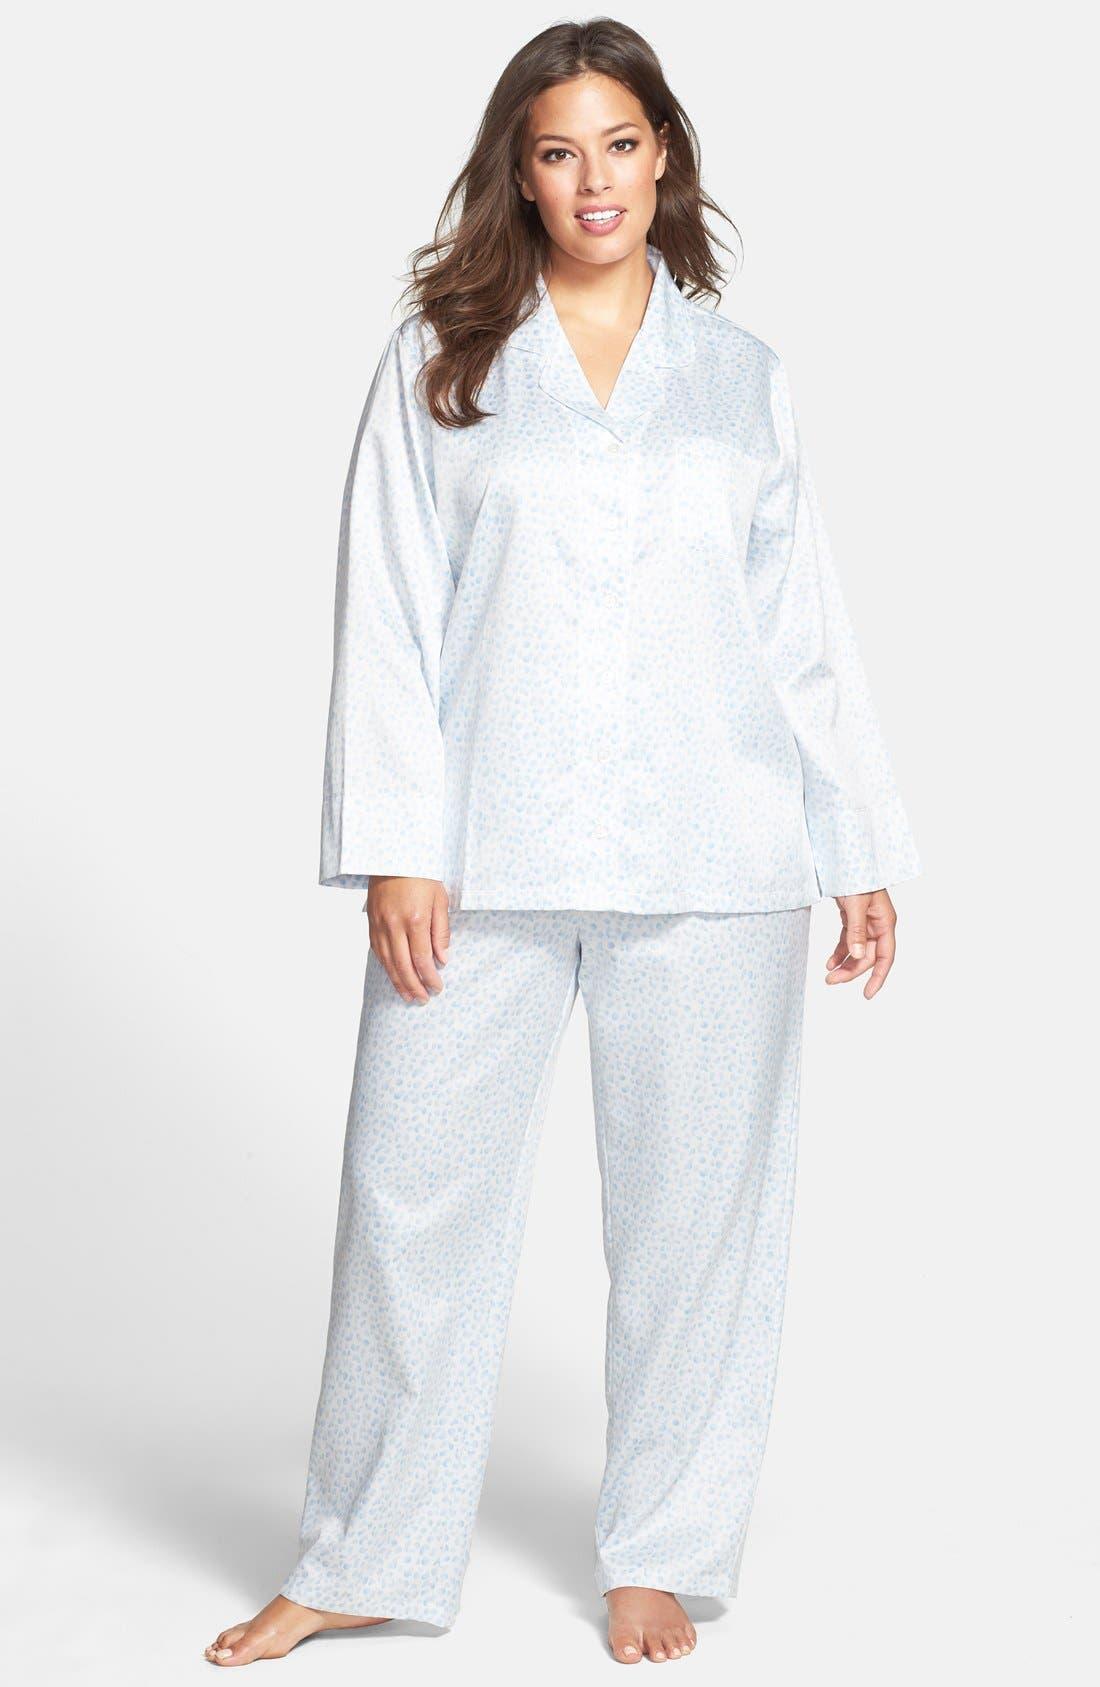 Carole Hochman Designs Brushed Back Satin Pajamas Plus Size